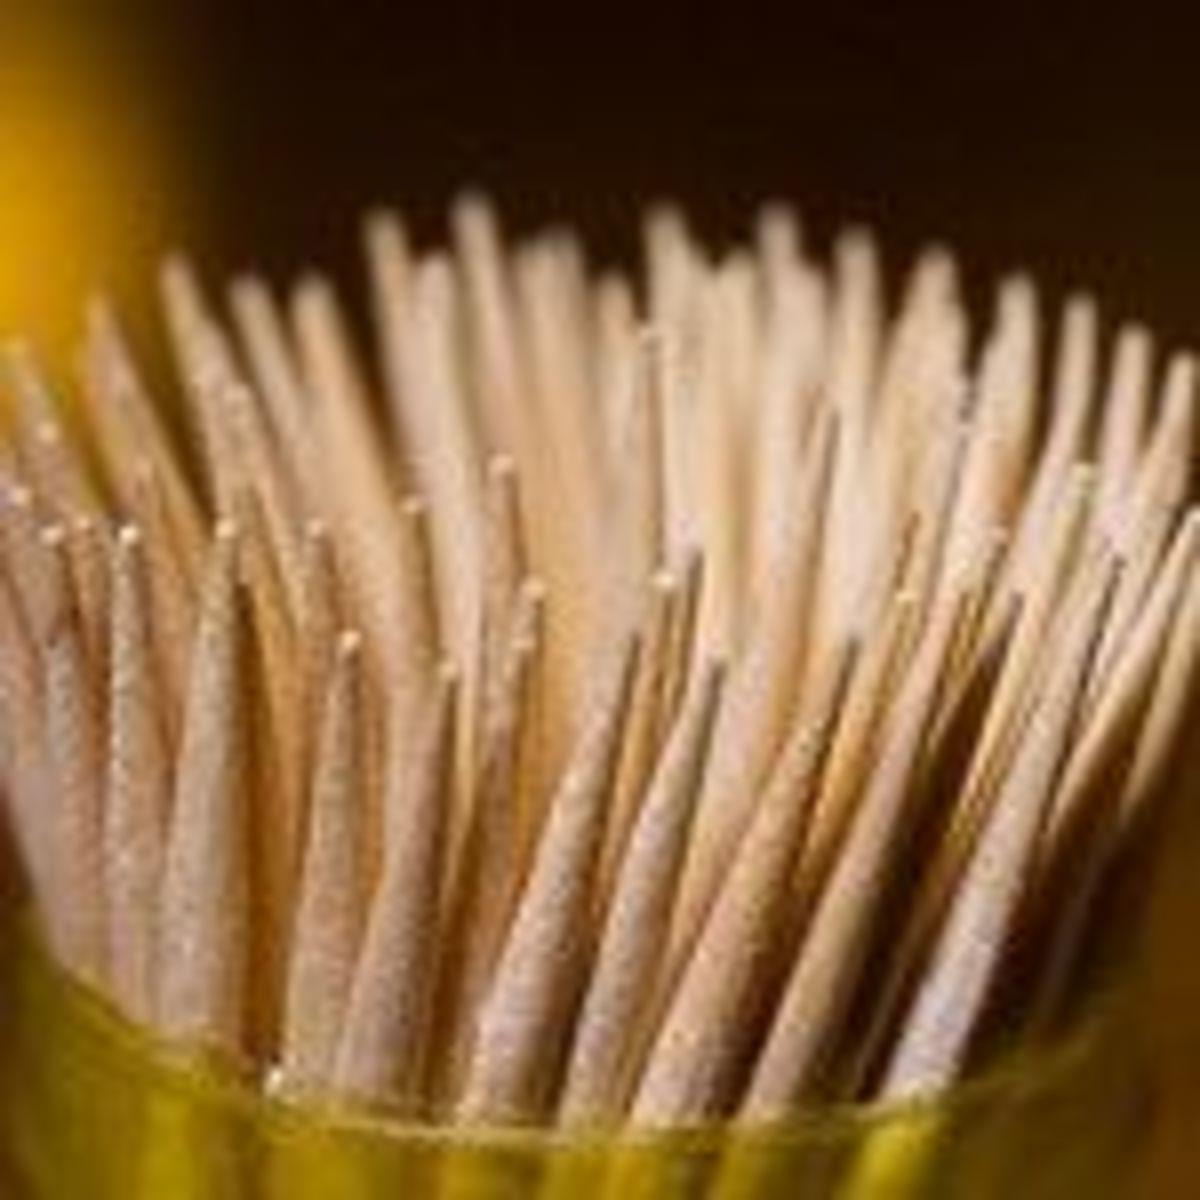 toothpicks for your fruit platter